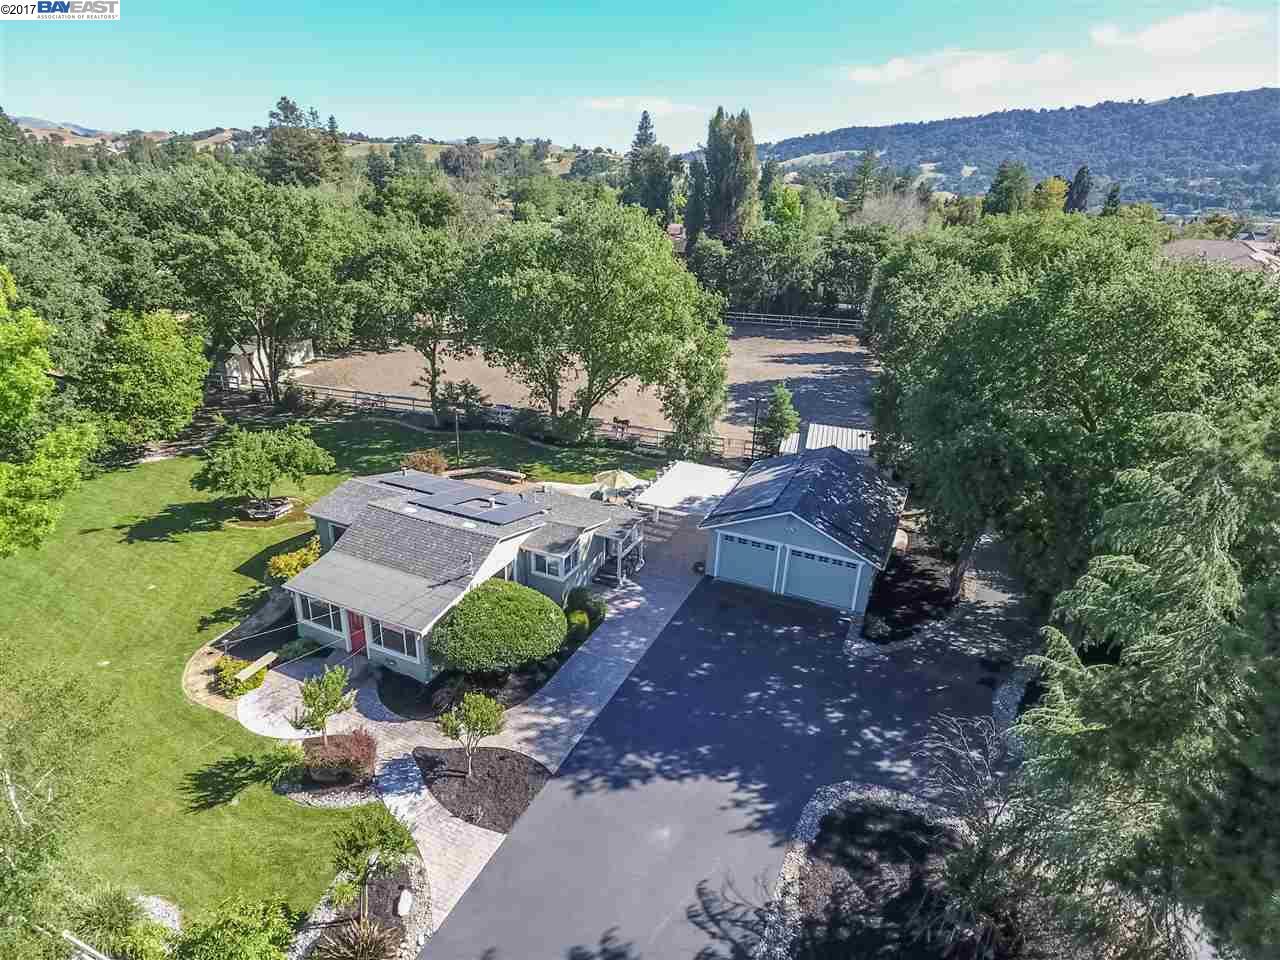 Single Family Home for Sale at 481 Sycamore Road Pleasanton, California 94566 United States